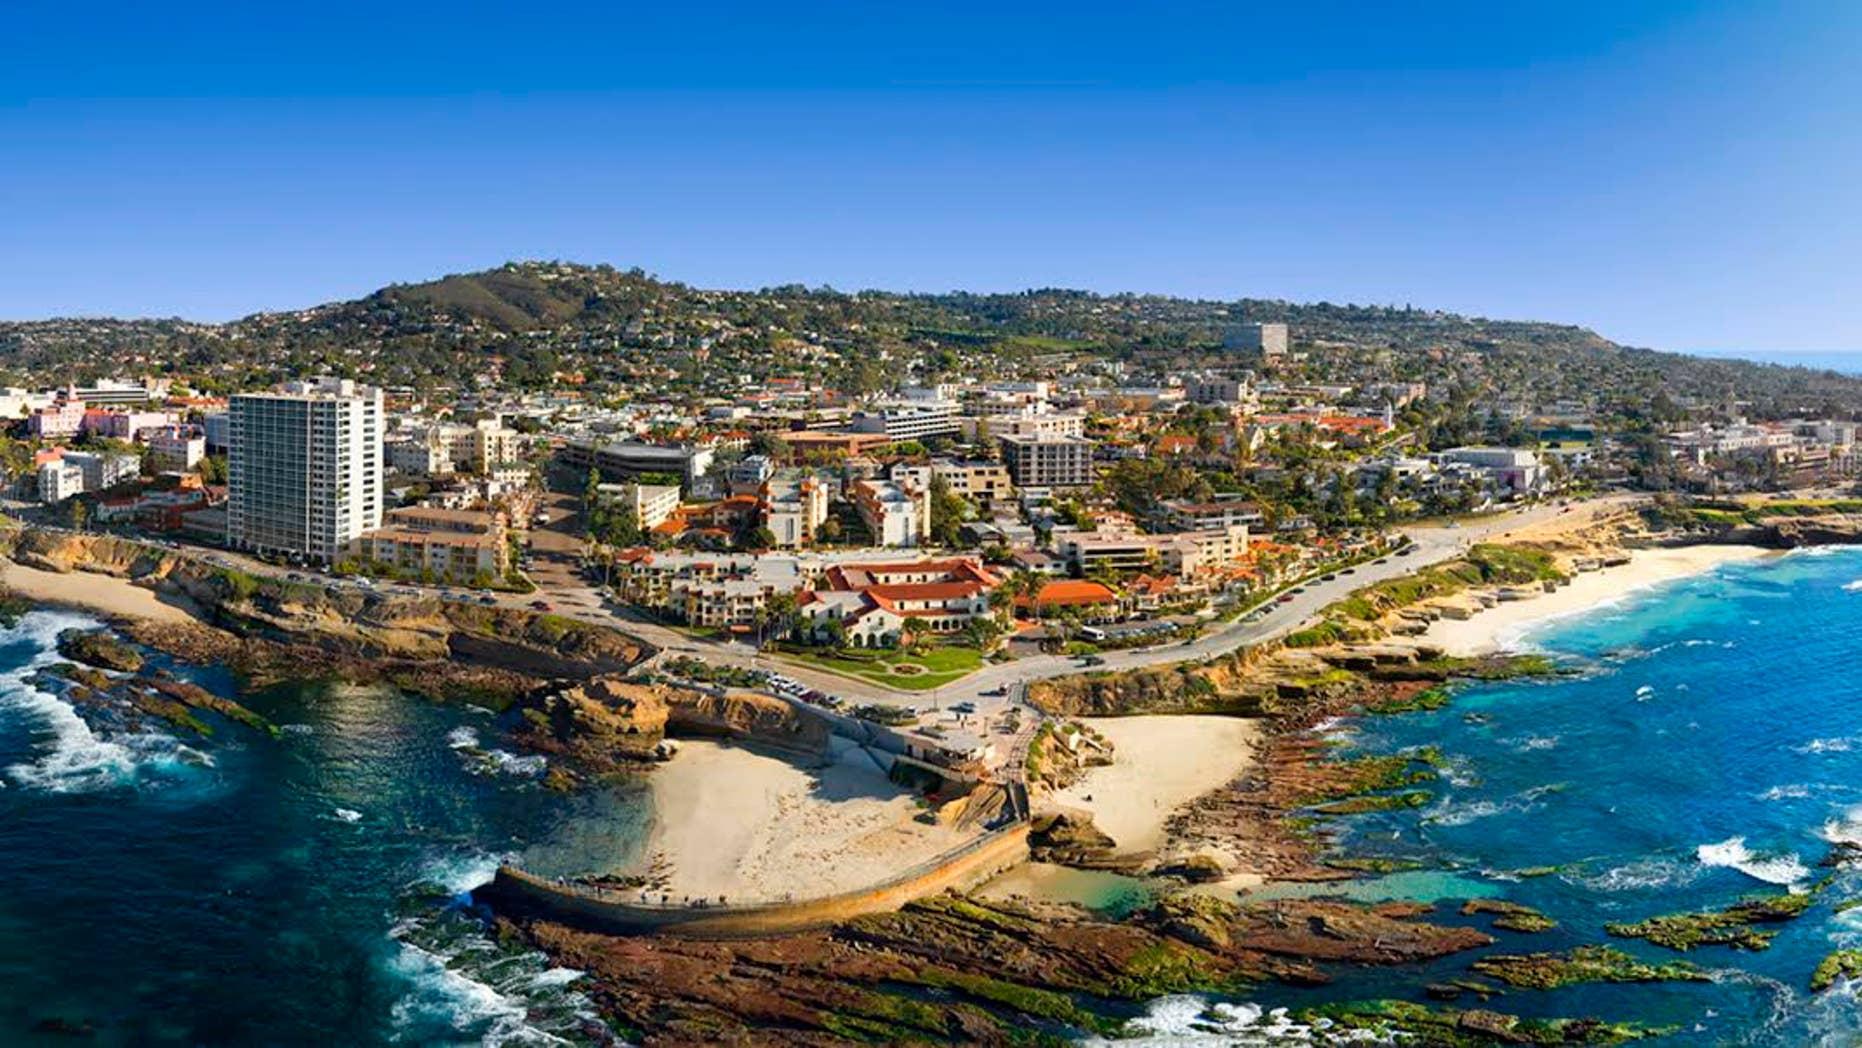 Enjoy sweeping views of San Diego's picturesque La Jolla.